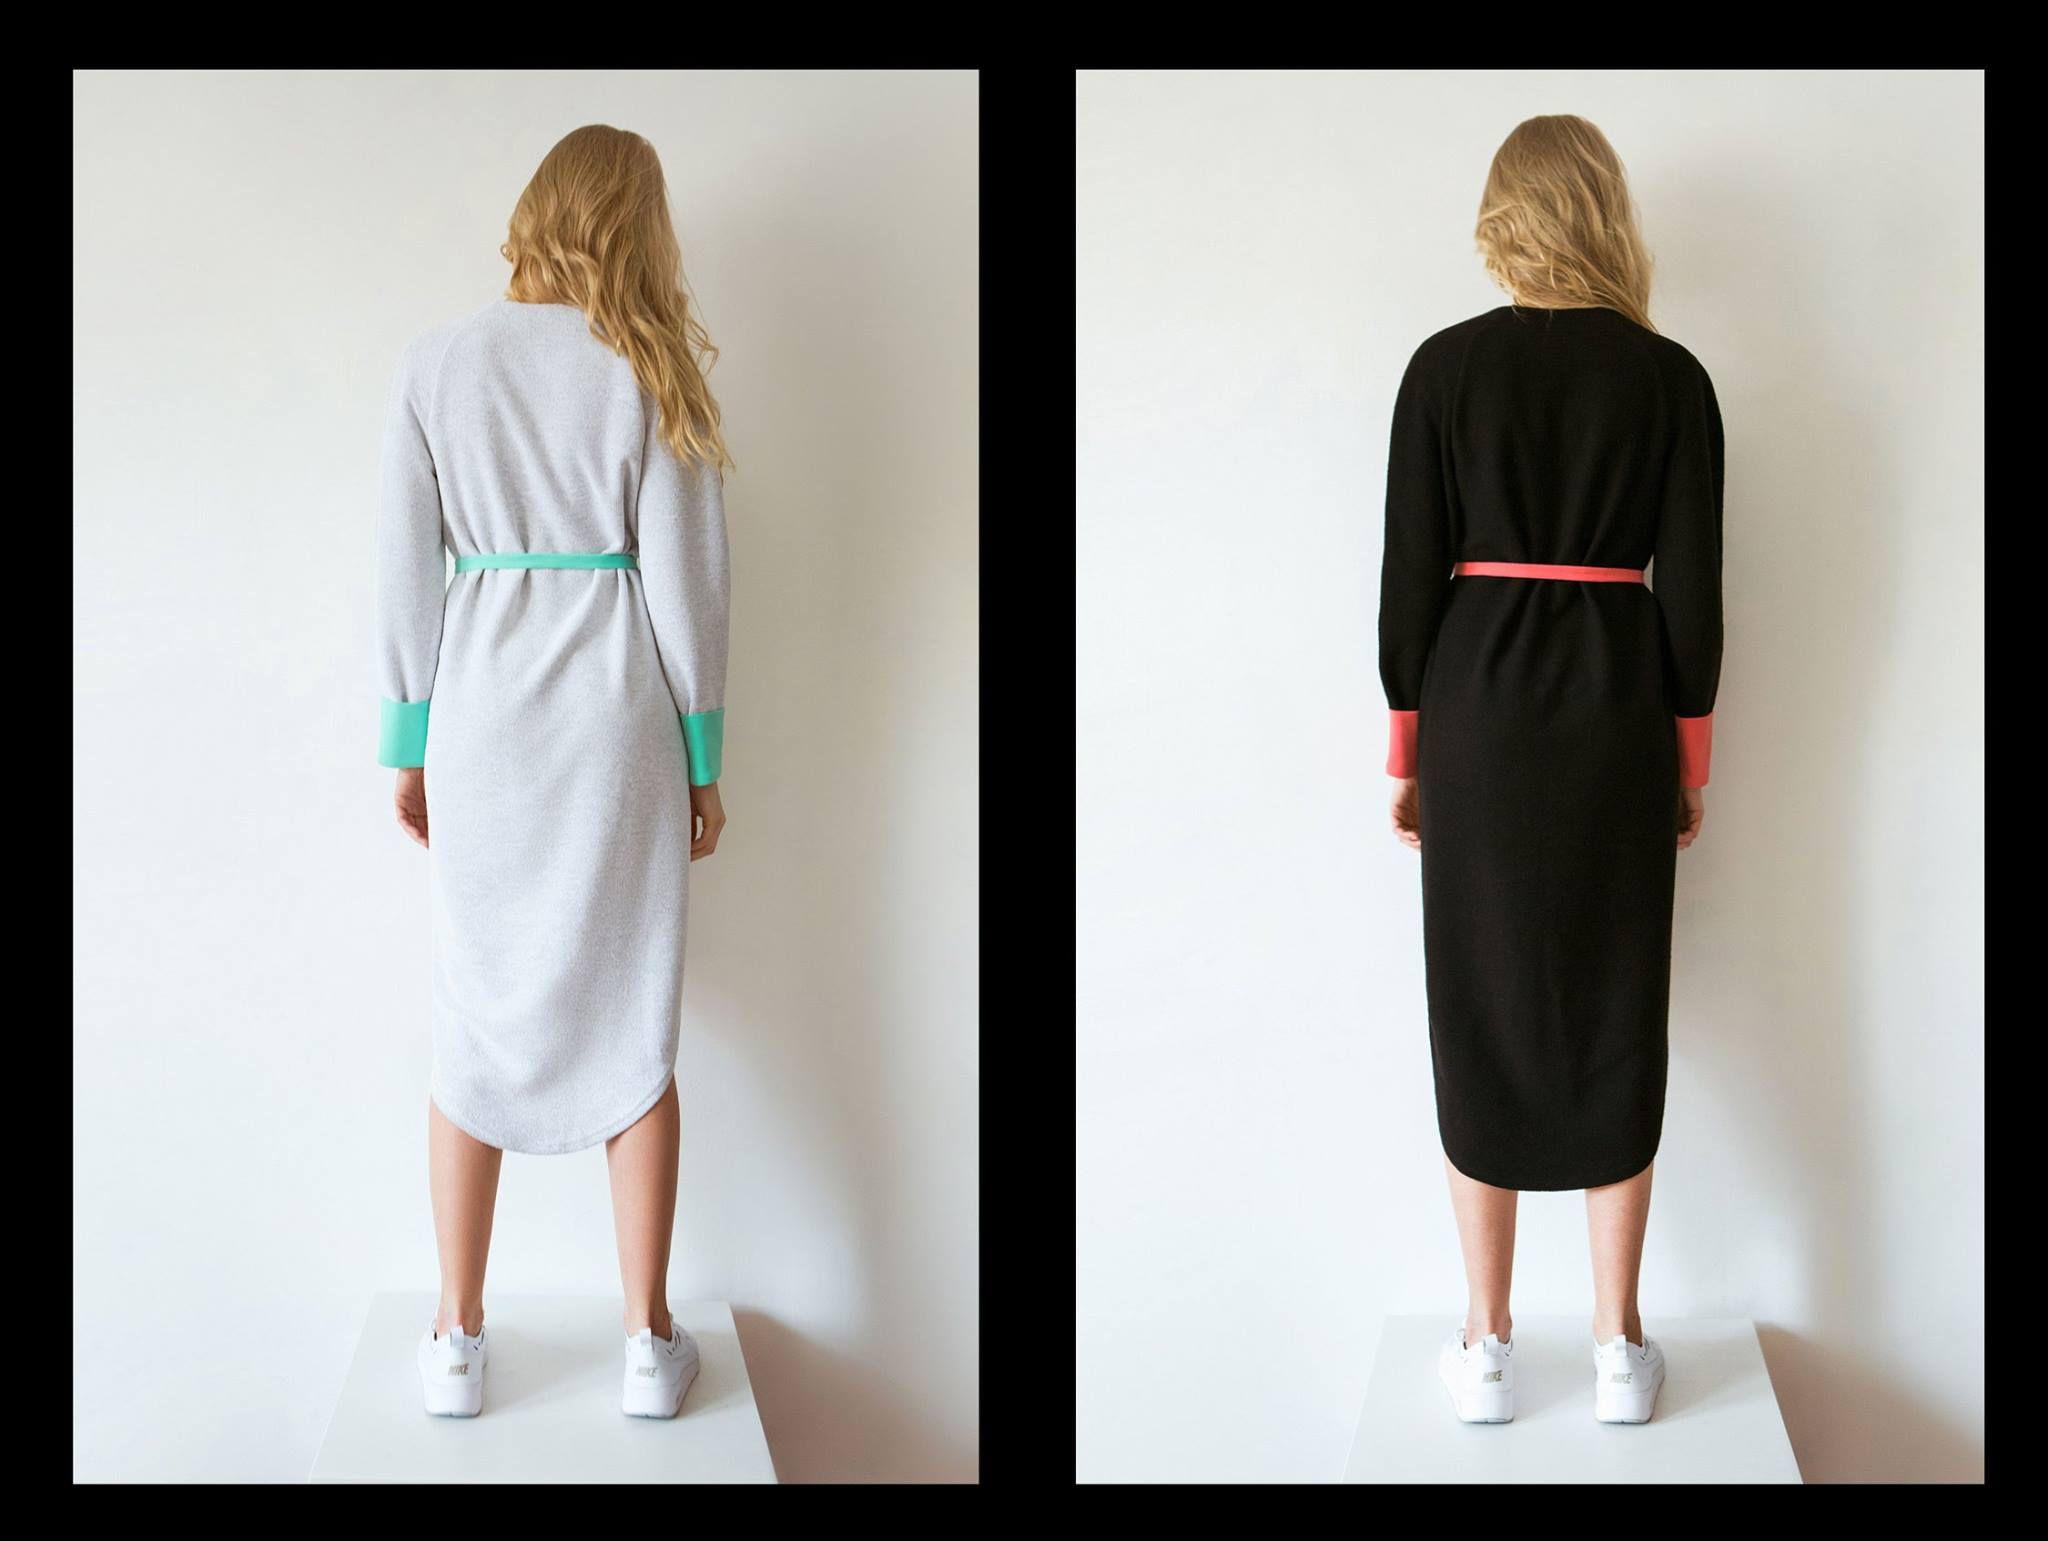 хлопок платье ksusharaikova одежда бренд эластан